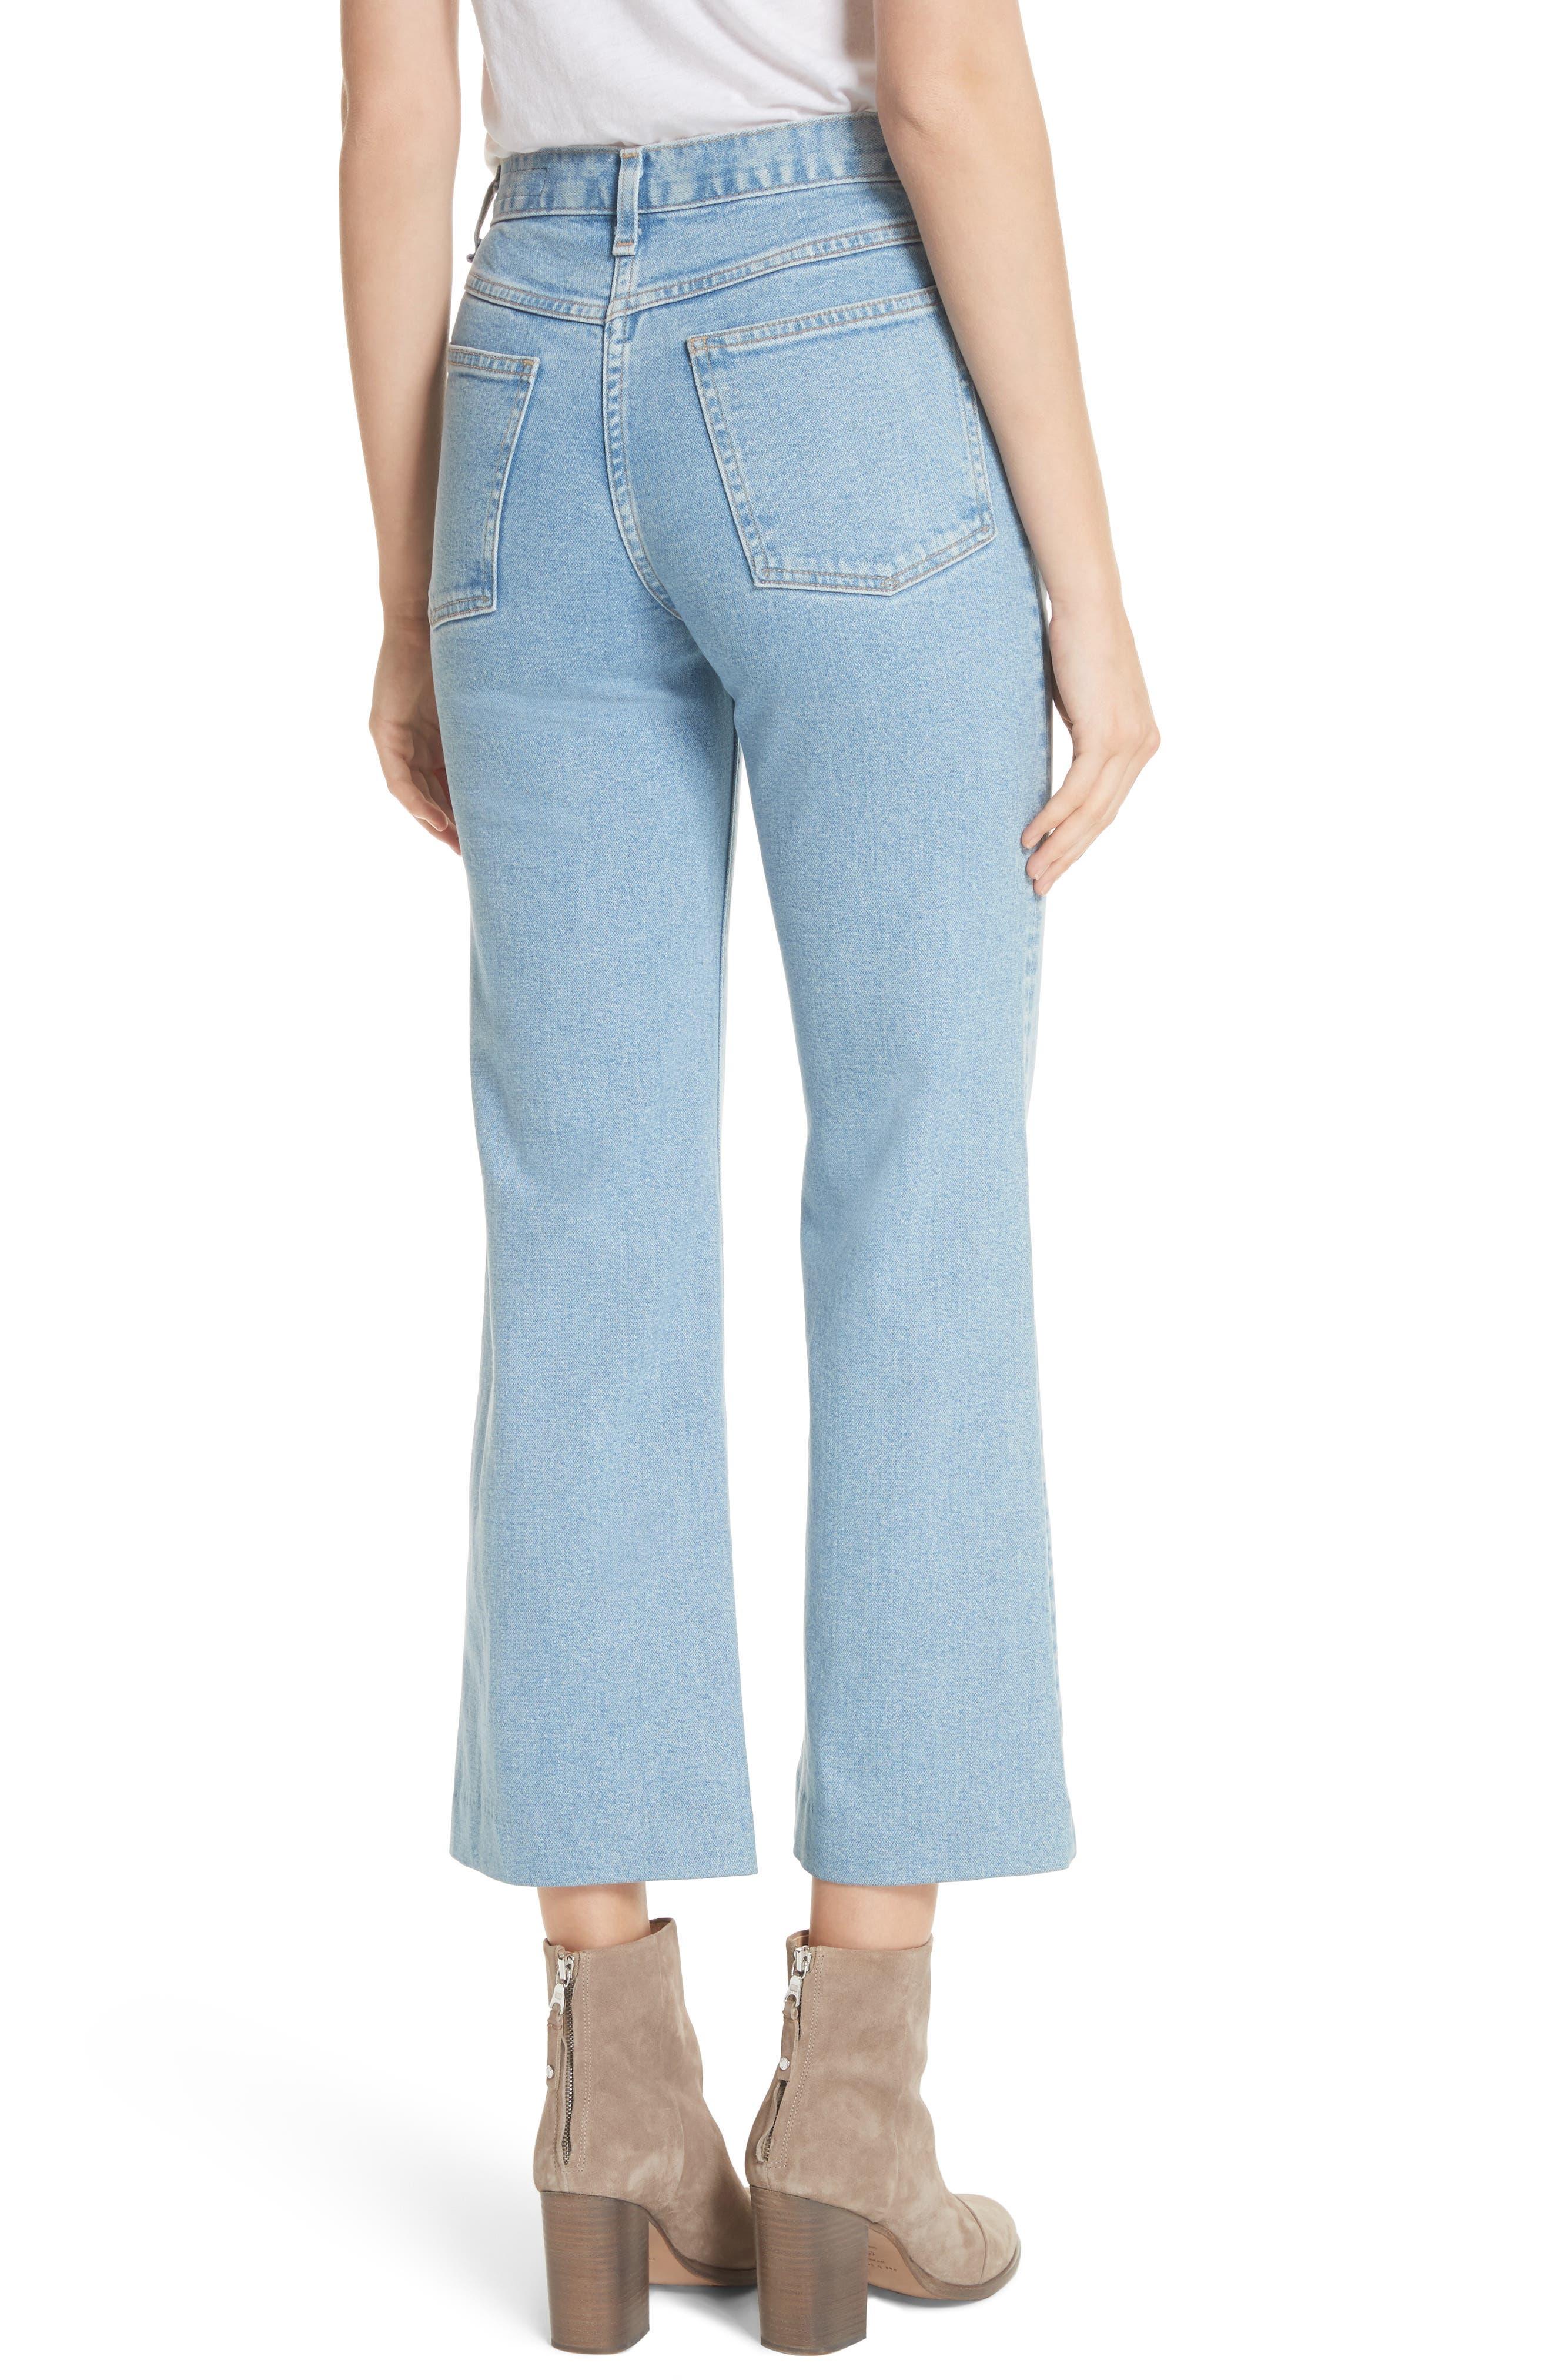 Justine High Waist Wide Leg Trouser Jeans,                             Alternate thumbnail 2, color,                             Broken Nelly